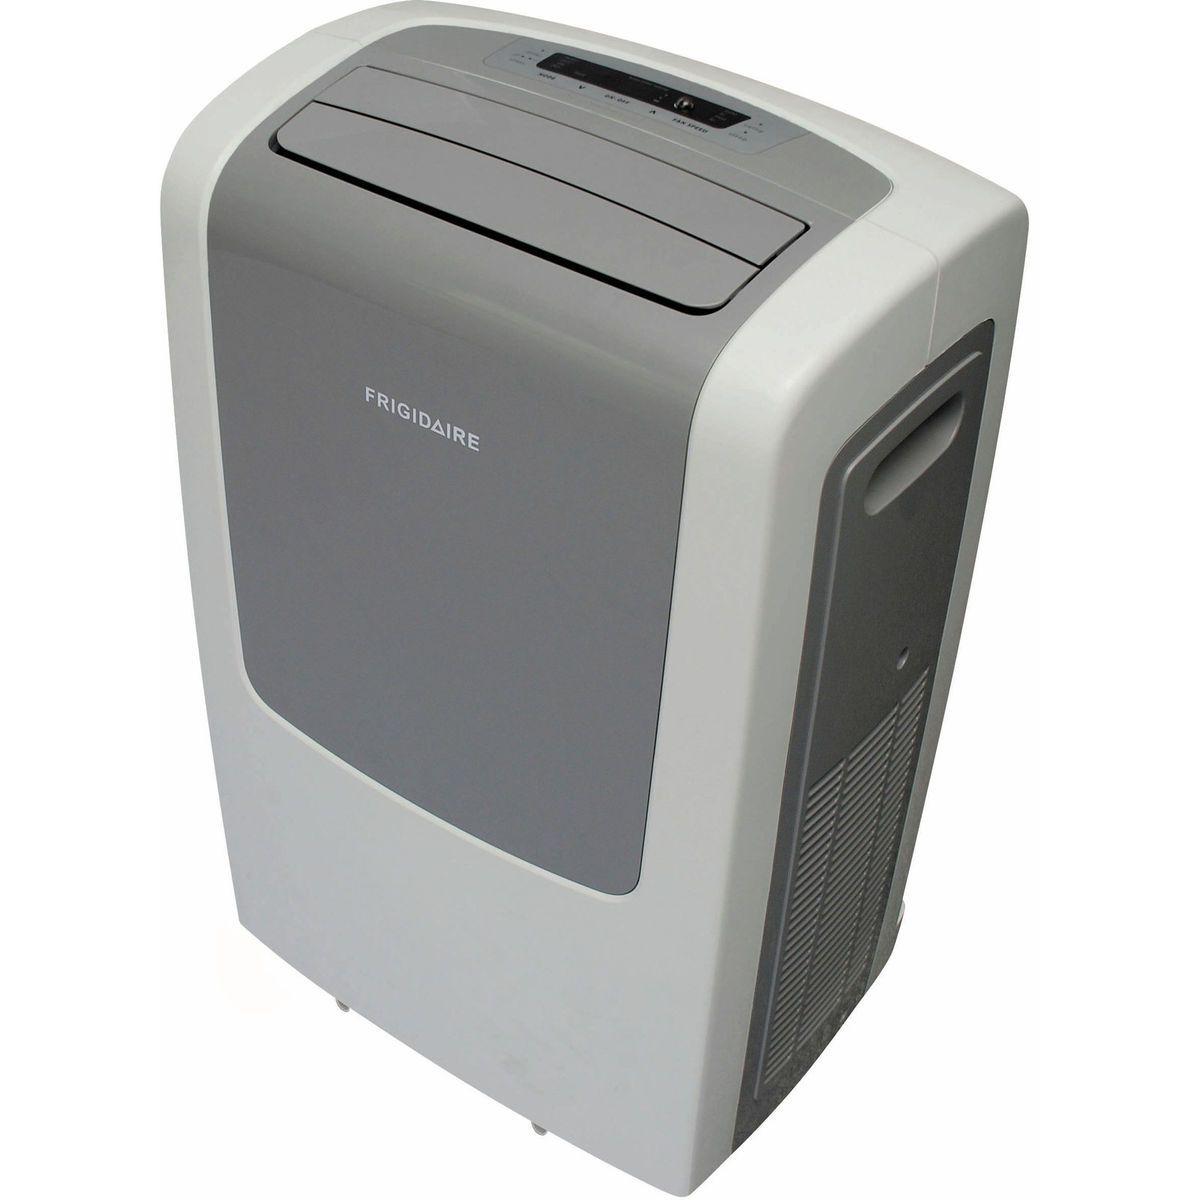 Frigidaire 9 000 BTU Heat Cool Portable Air Conditioner FRA09EPT1